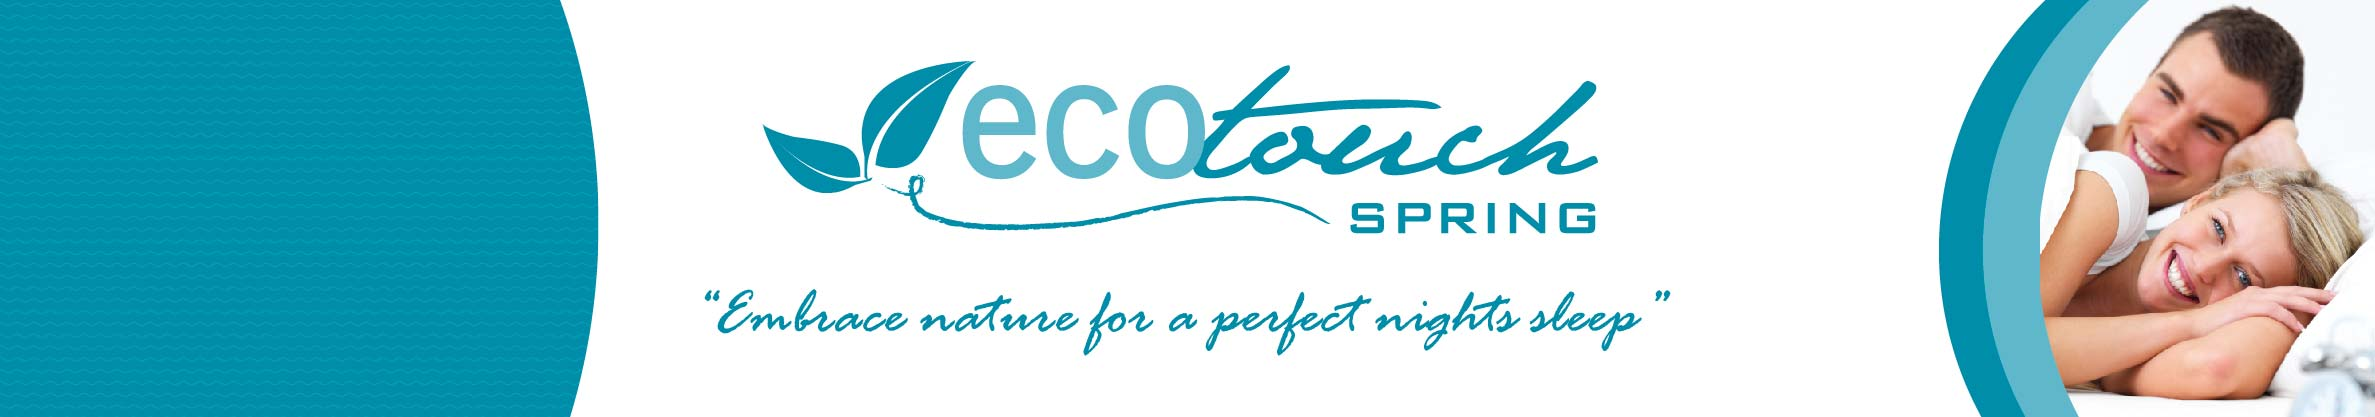 EcoTouch Spring Therapedic Mattress Header